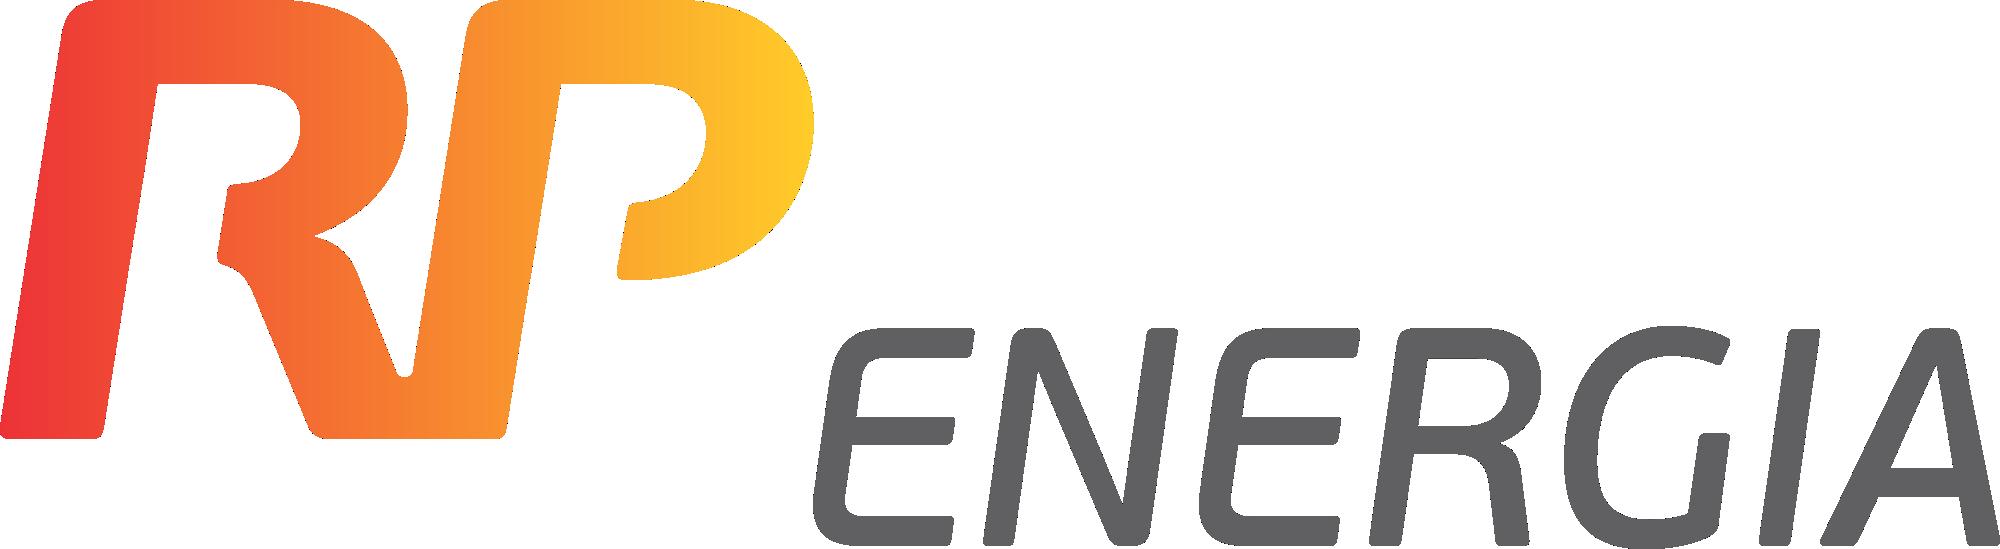 rp energia - marca